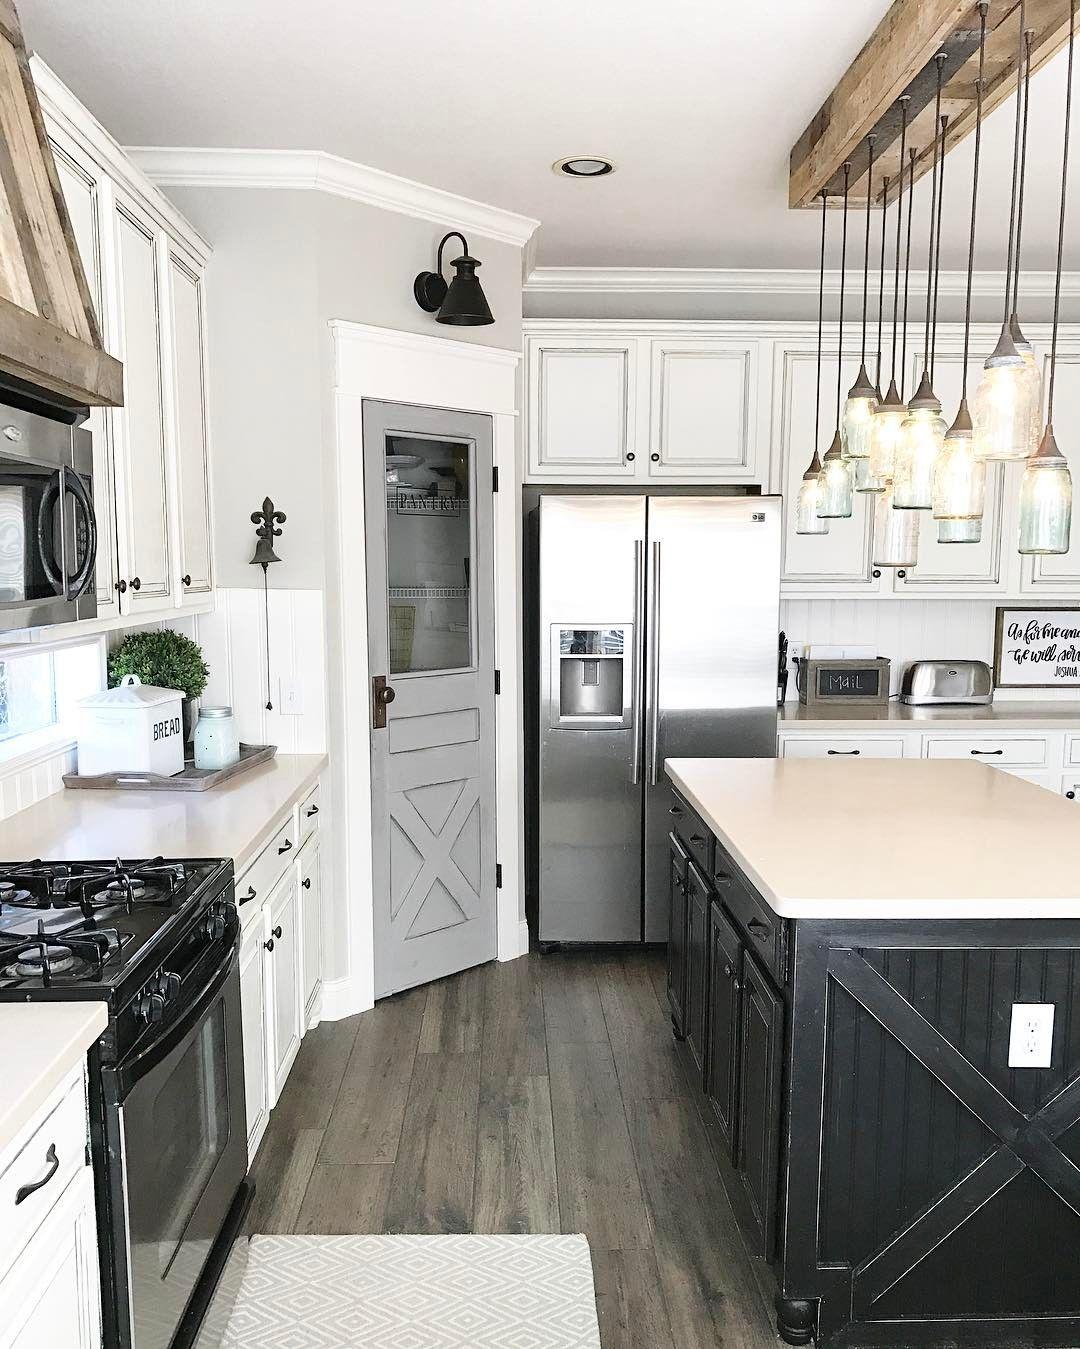 Fixer Upper Kitchen Backsplash: 25 Gorgeous Modern Farmhouse Kitchens